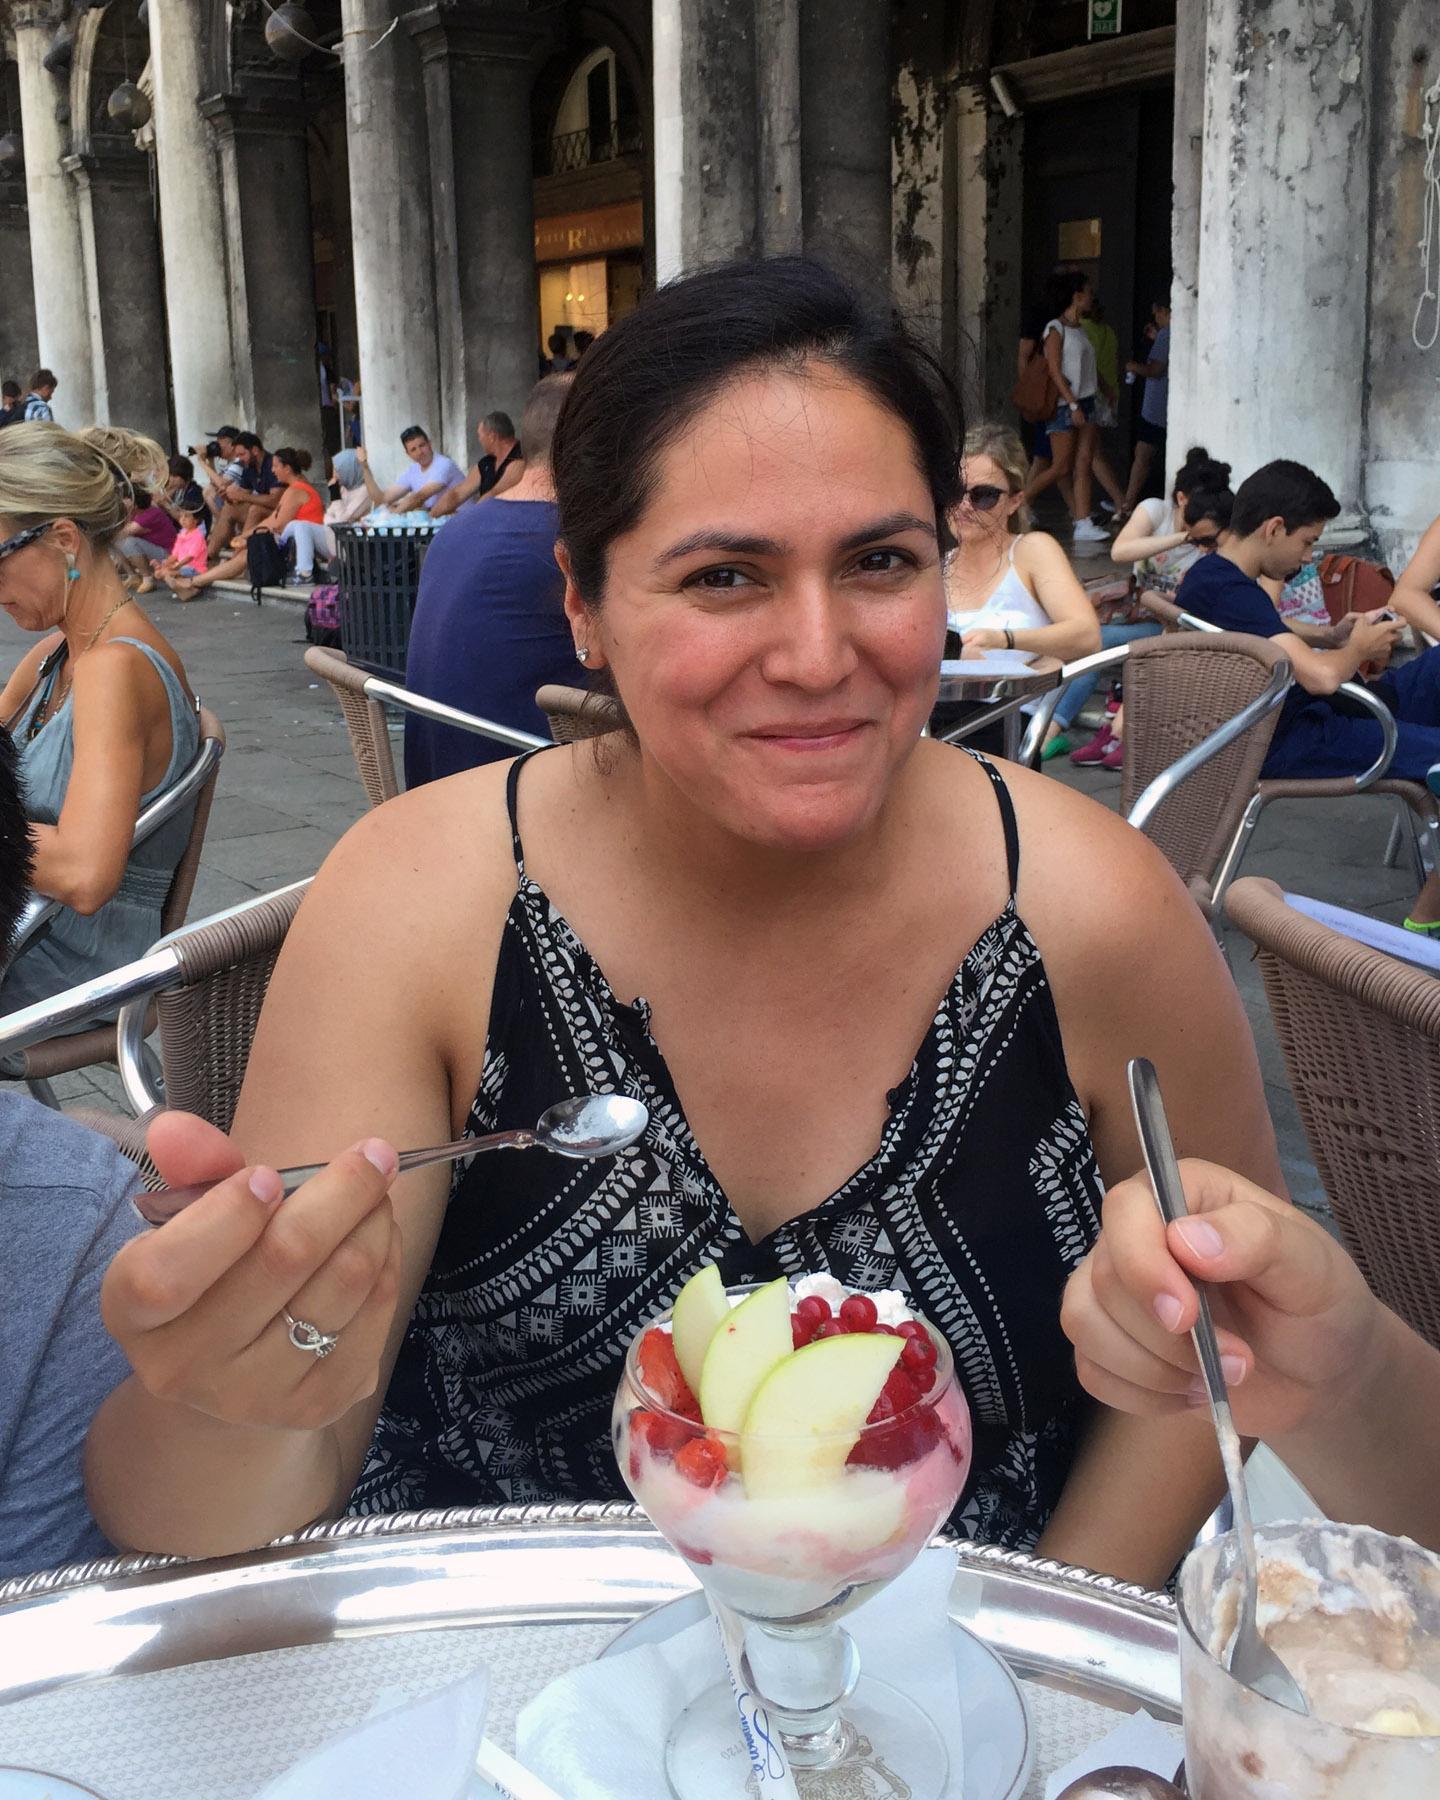 Caffè Florian, St. Mark's Square, Venice, Italy 2015